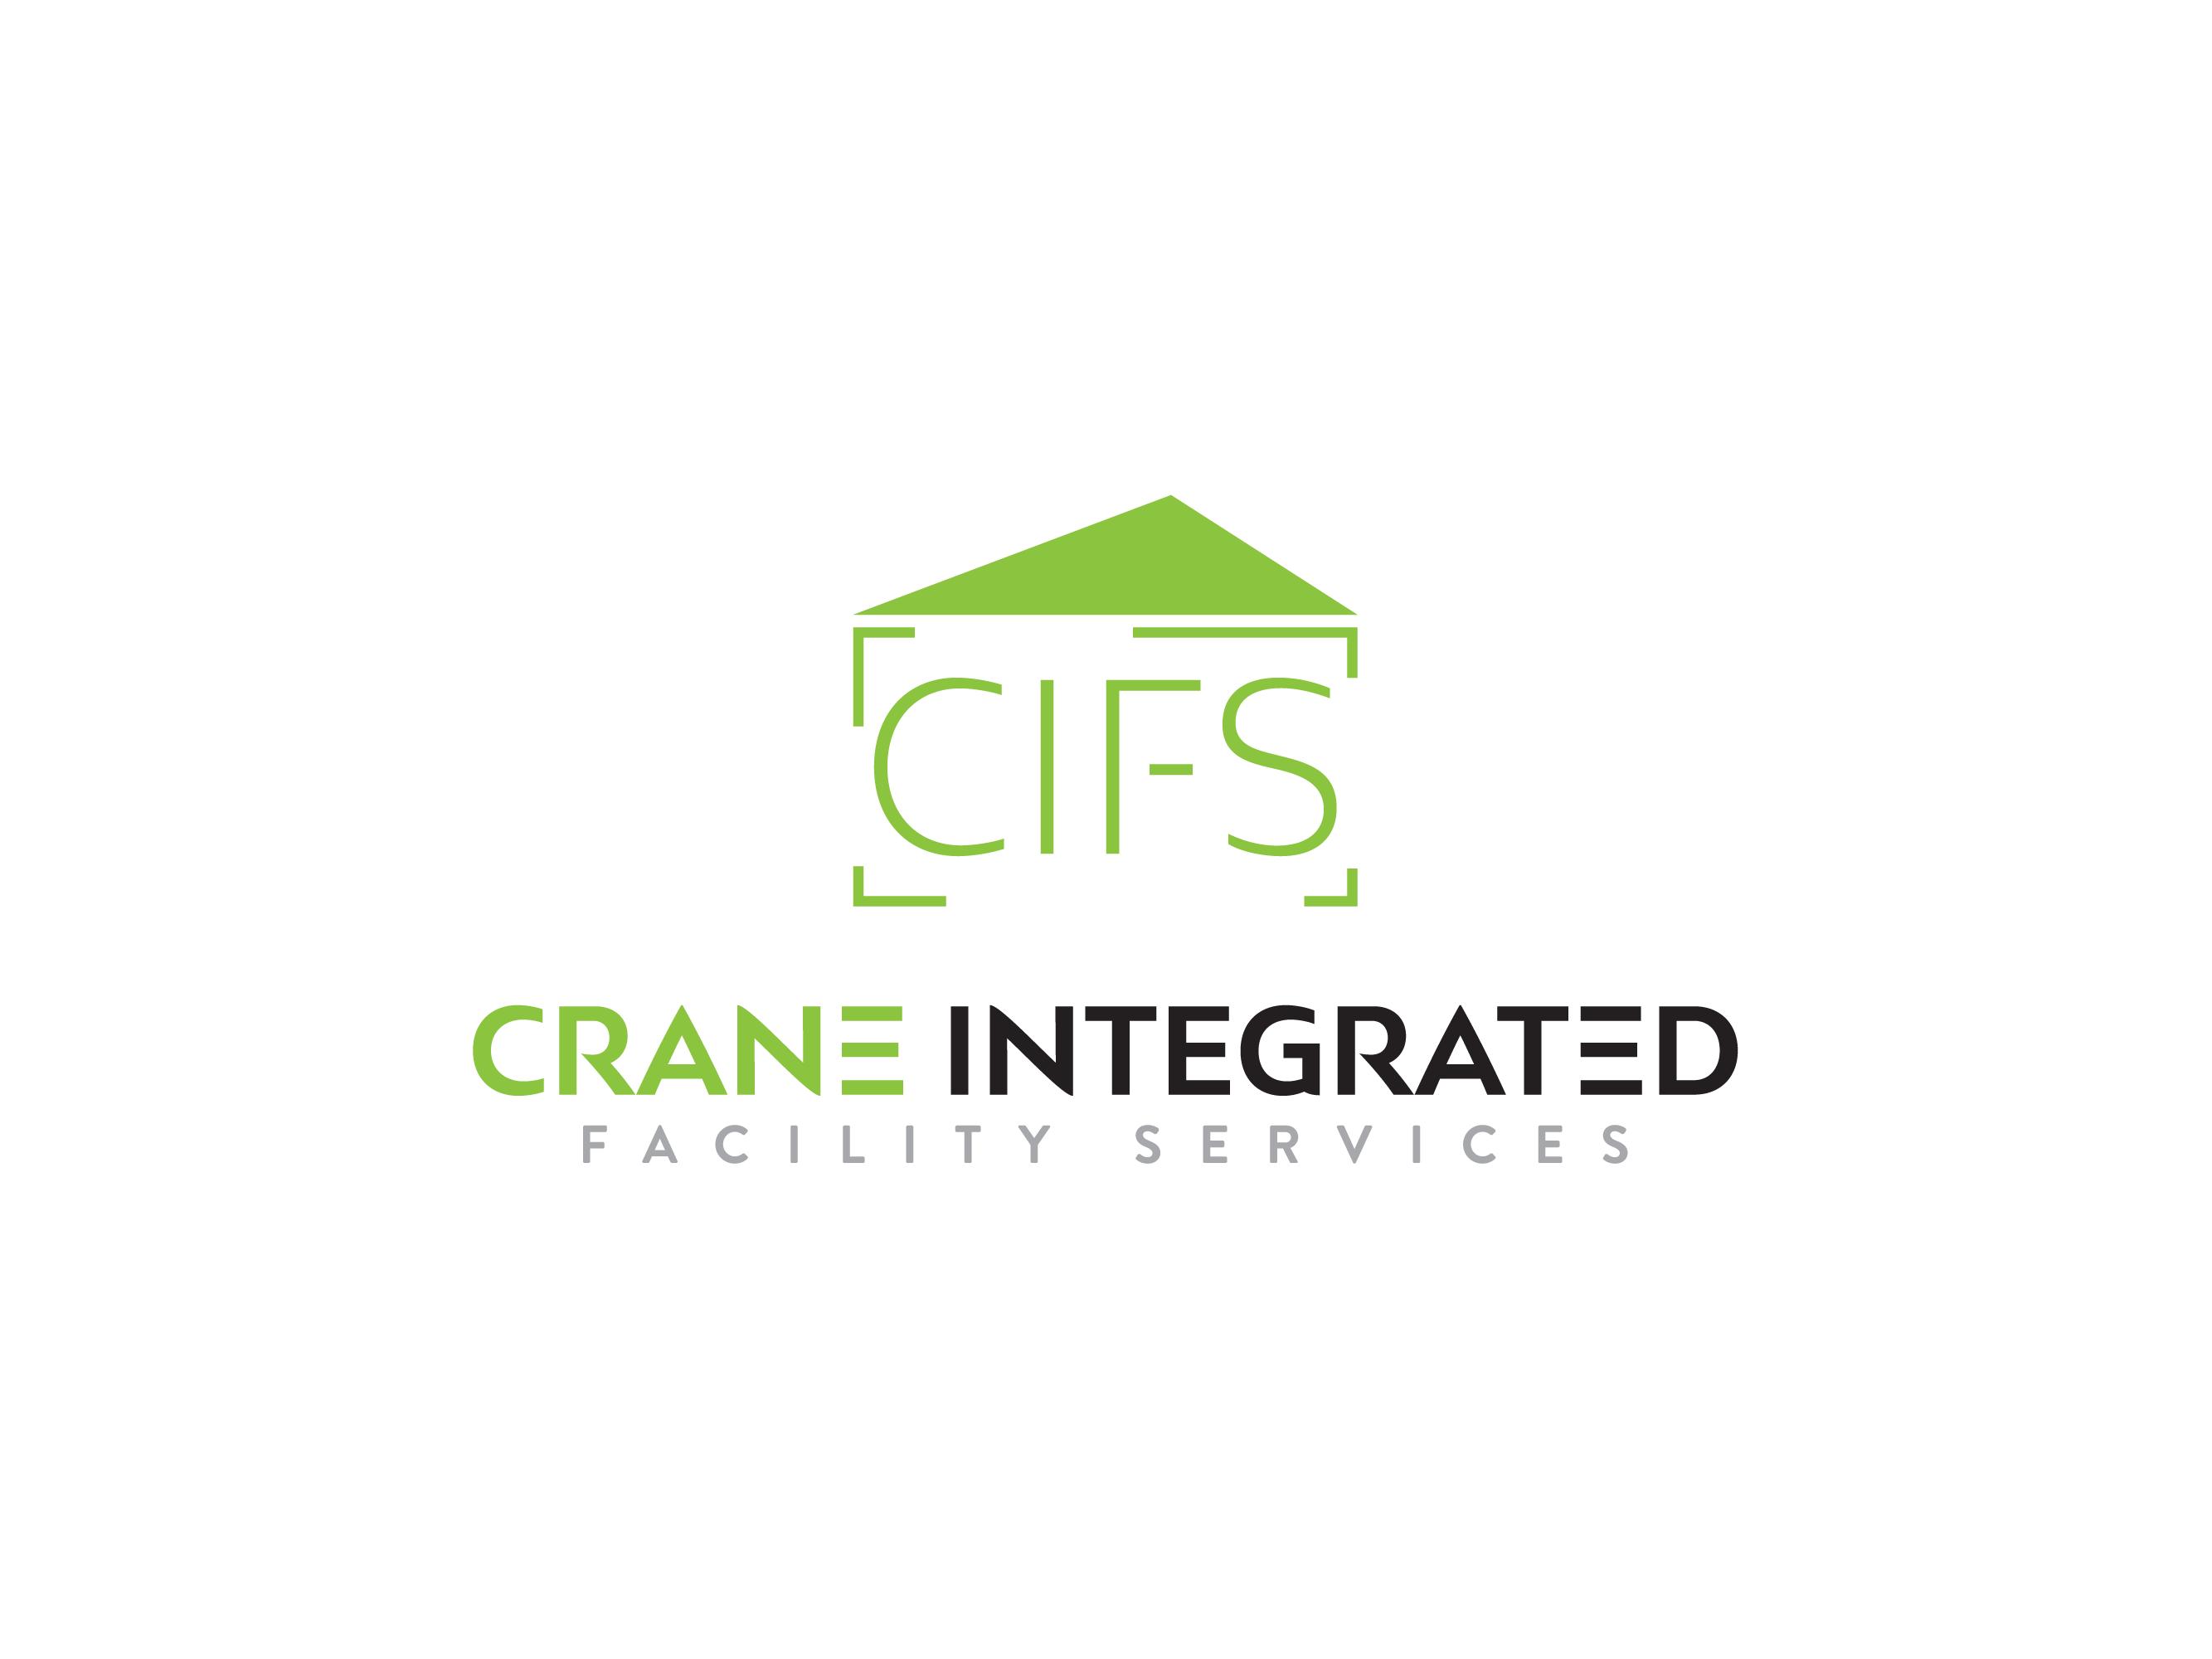 Logo Design by Probir Ghosh - Entry No. 113 in the Logo Design Contest Inspiring Logo Design for Crane Integrated Facility Services.